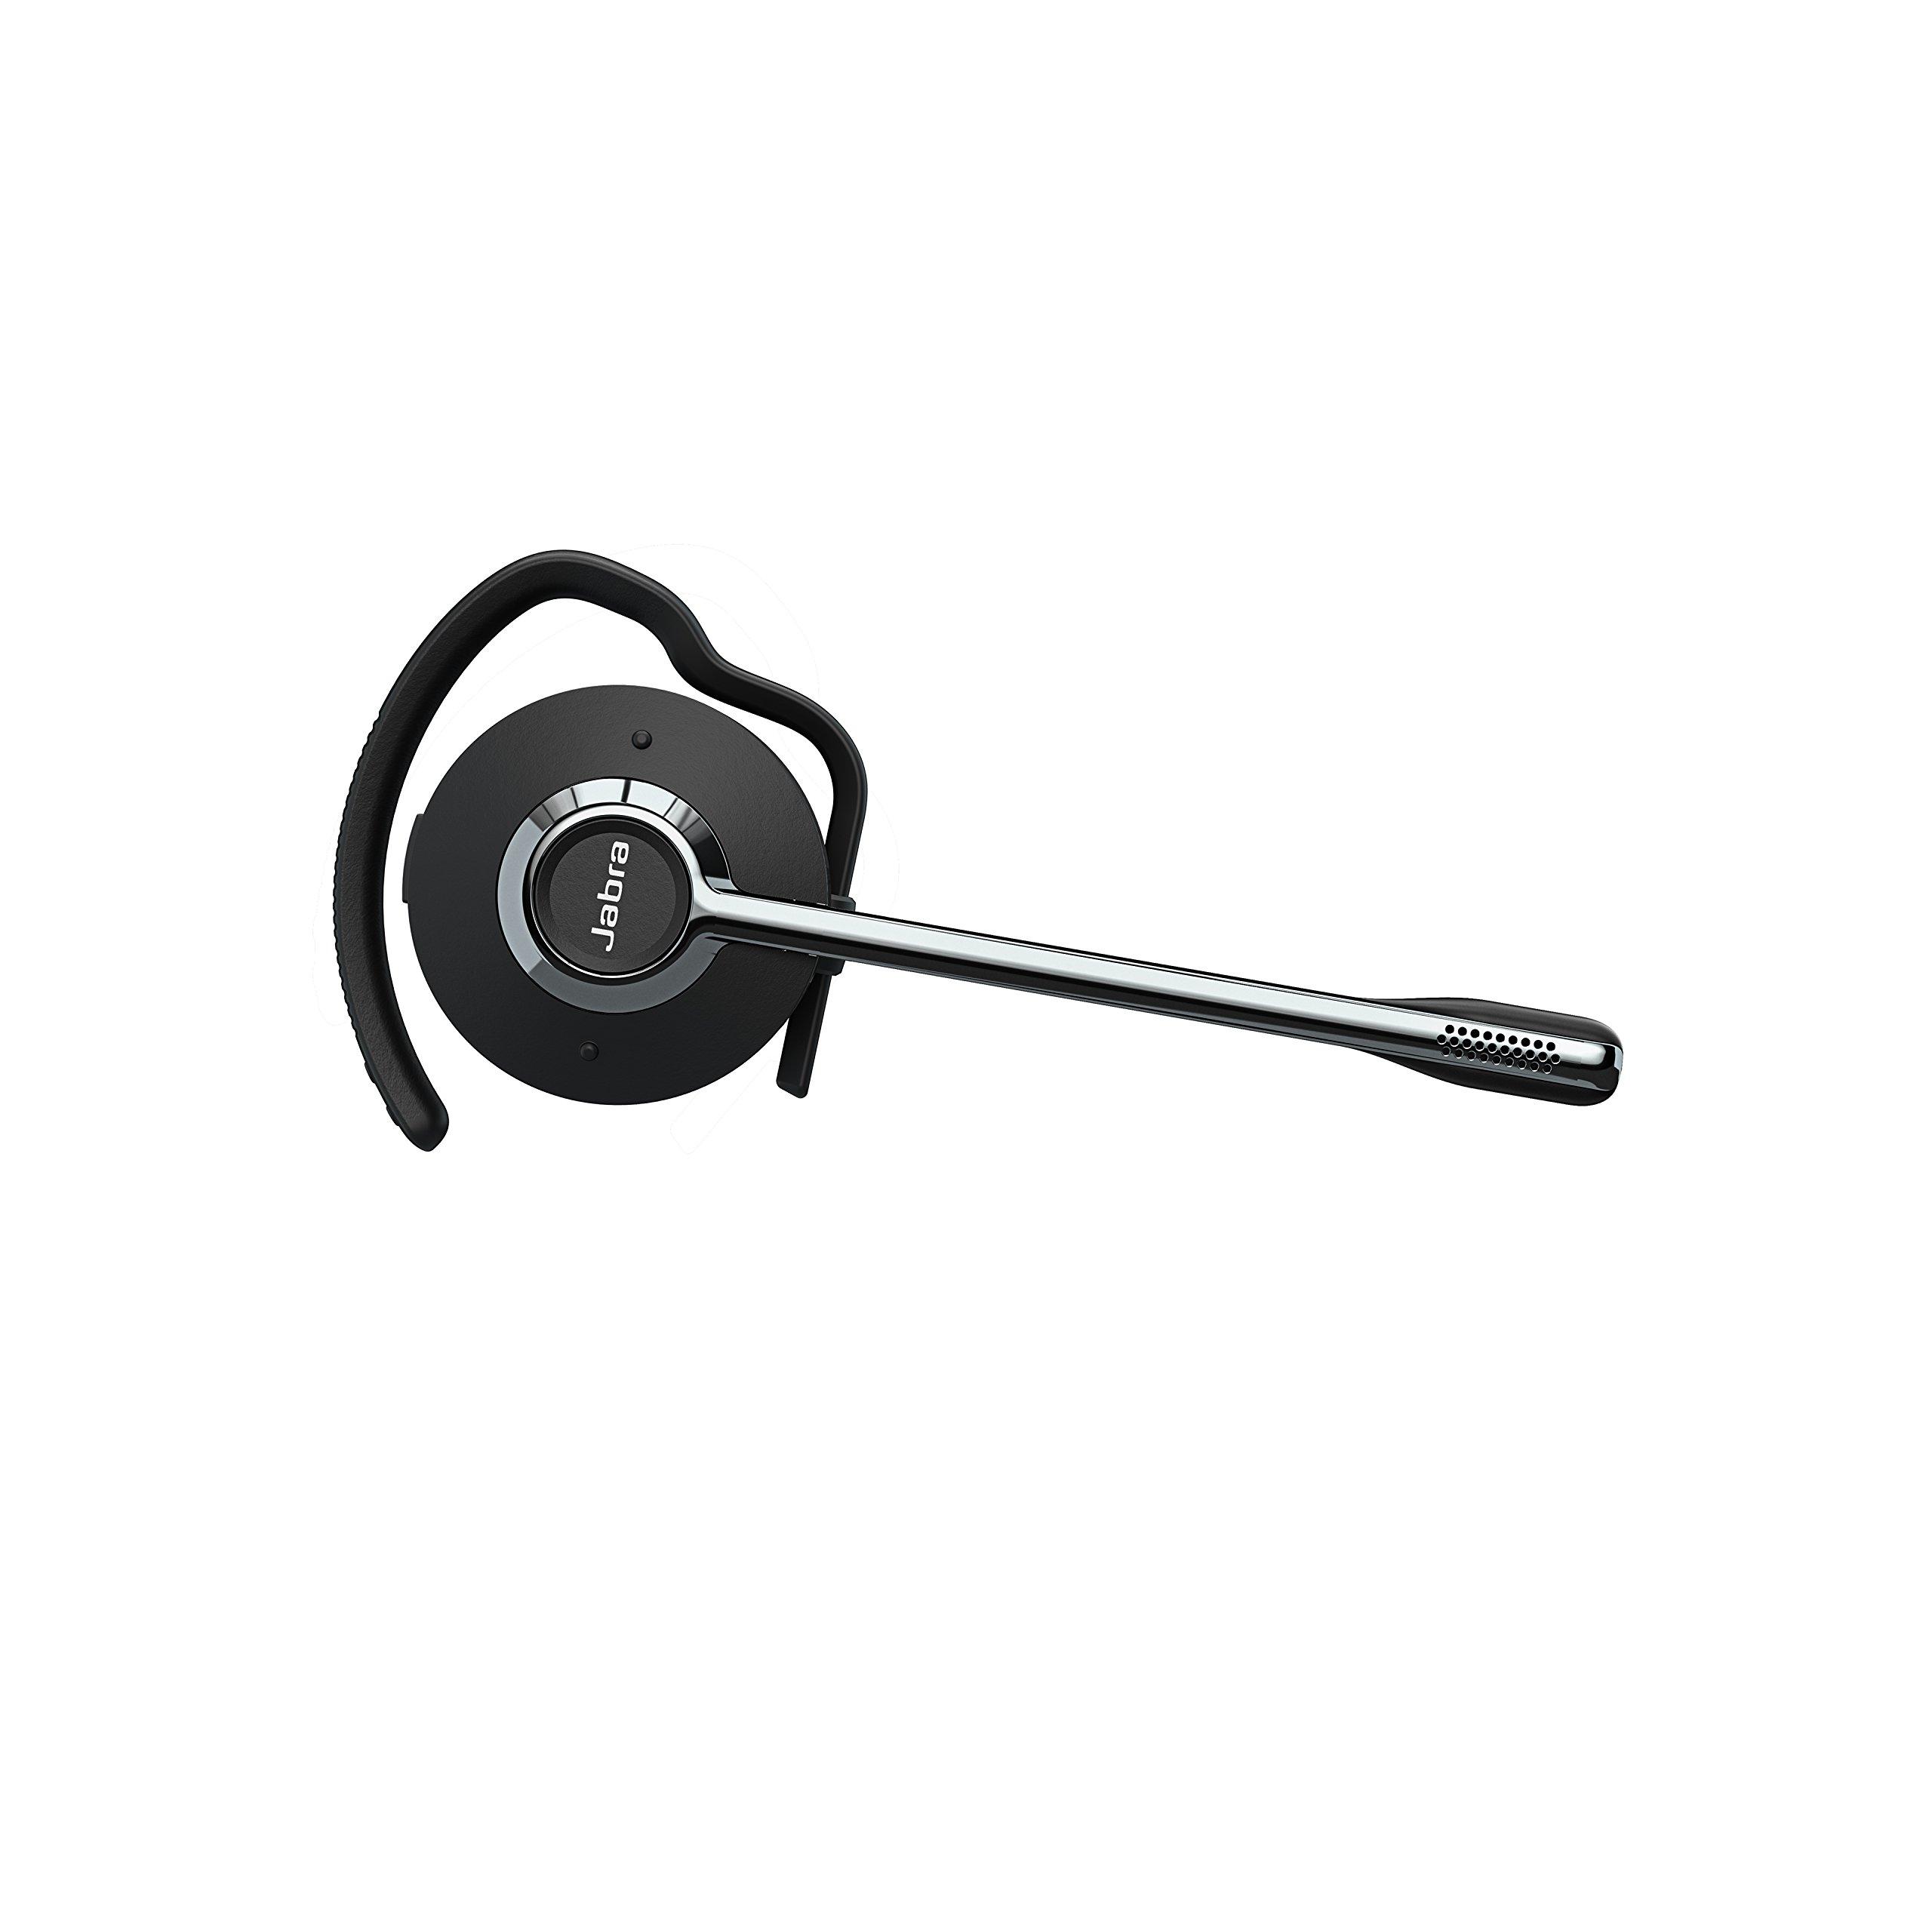 Jabra Engage Convertible Headset 14401-19 by Jabra